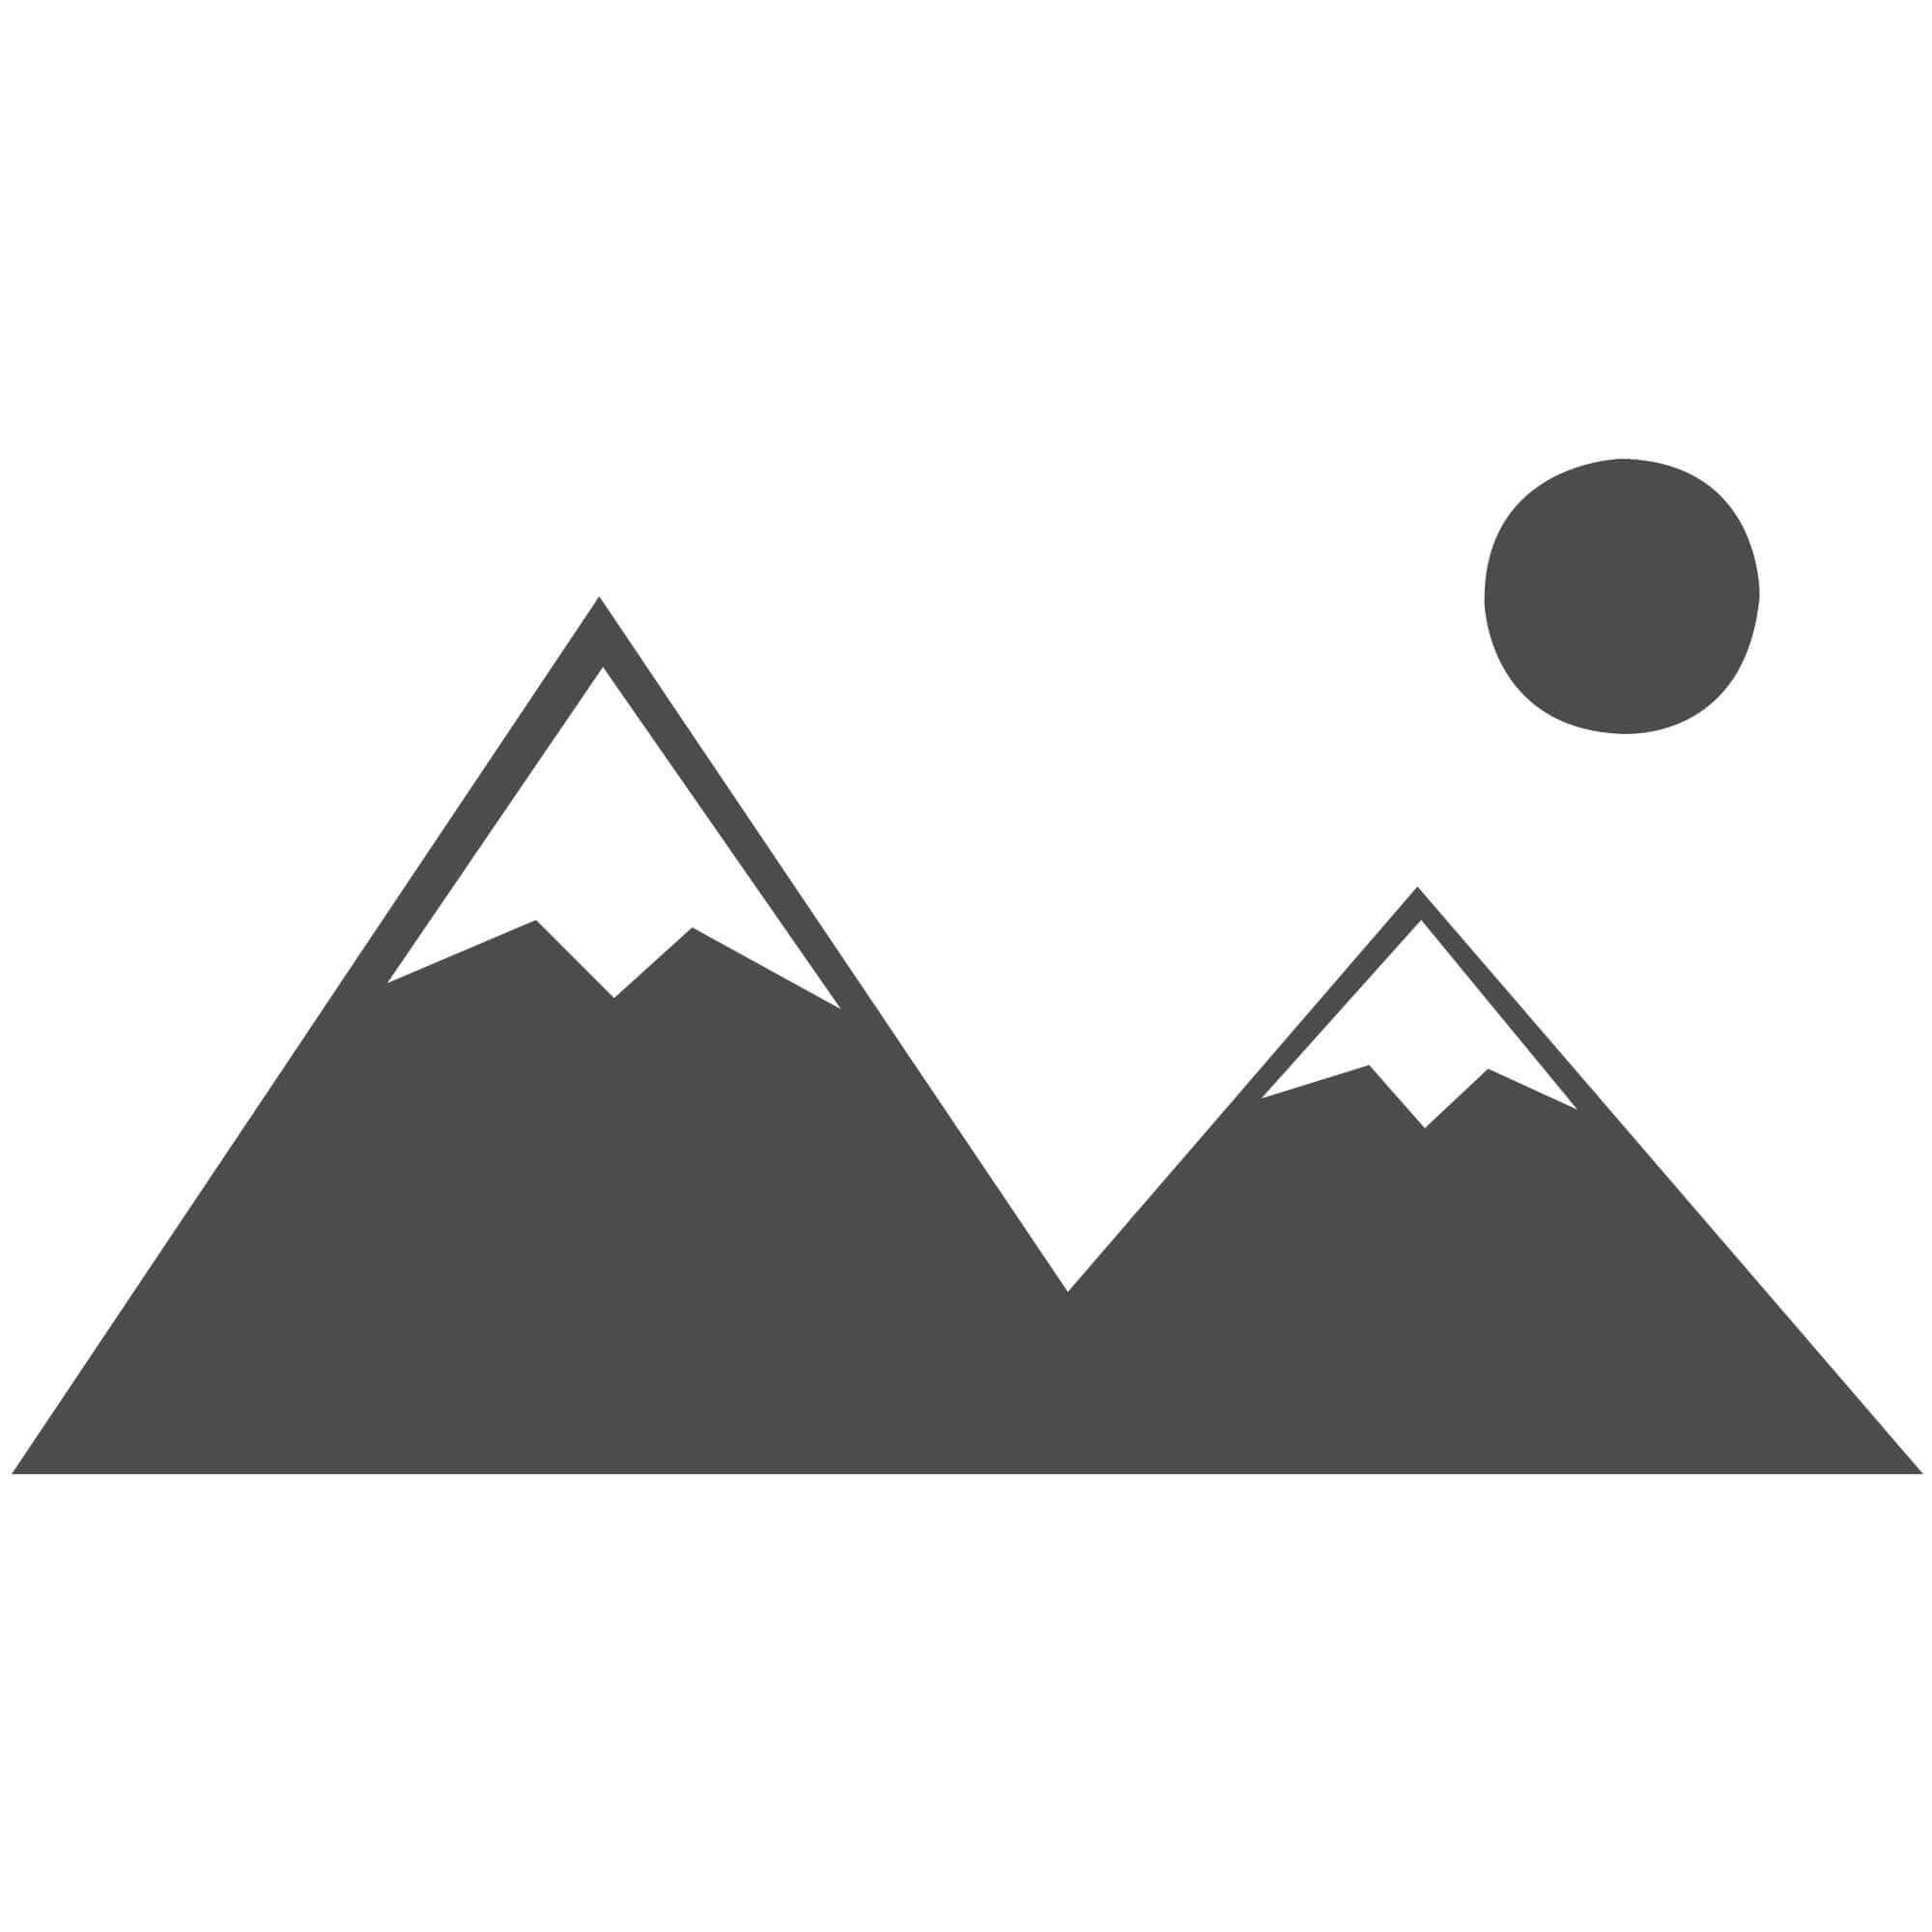 "Galleria Rug - Stripe Multi 79164 4848 - Size 133 x 195 cm (4'4"" x 6'5"")"